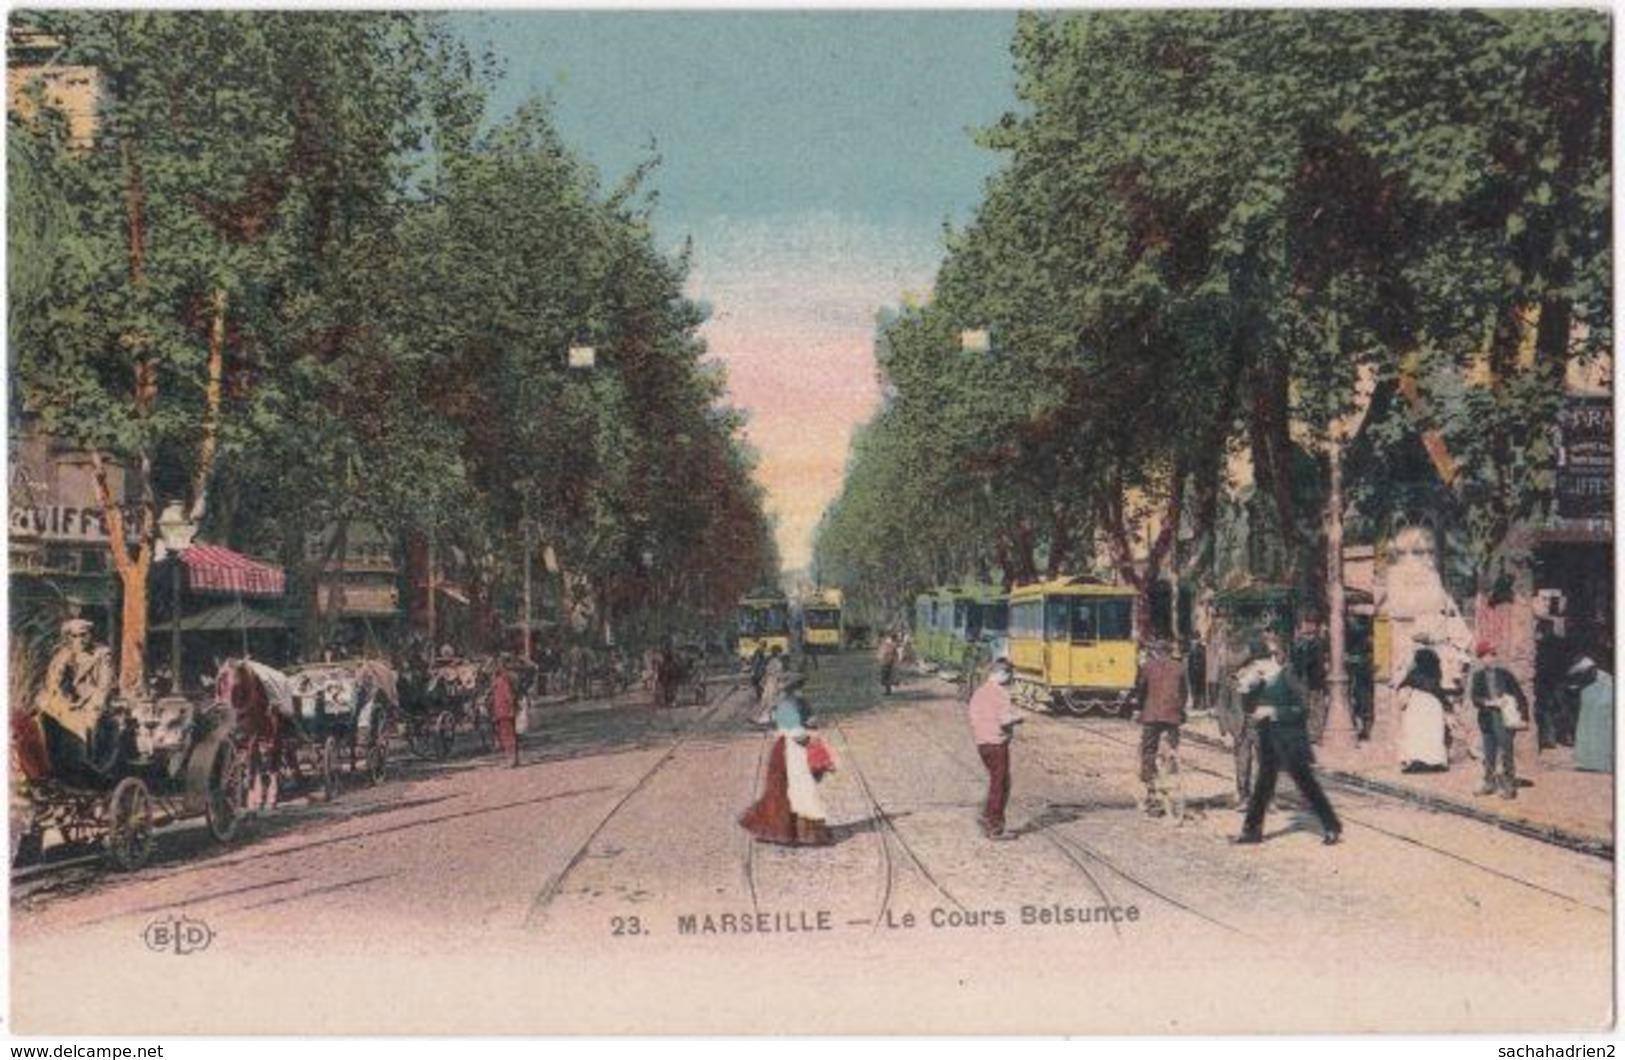 13. MARSEILLE. Le Cours Belsunce. 23 - Unclassified